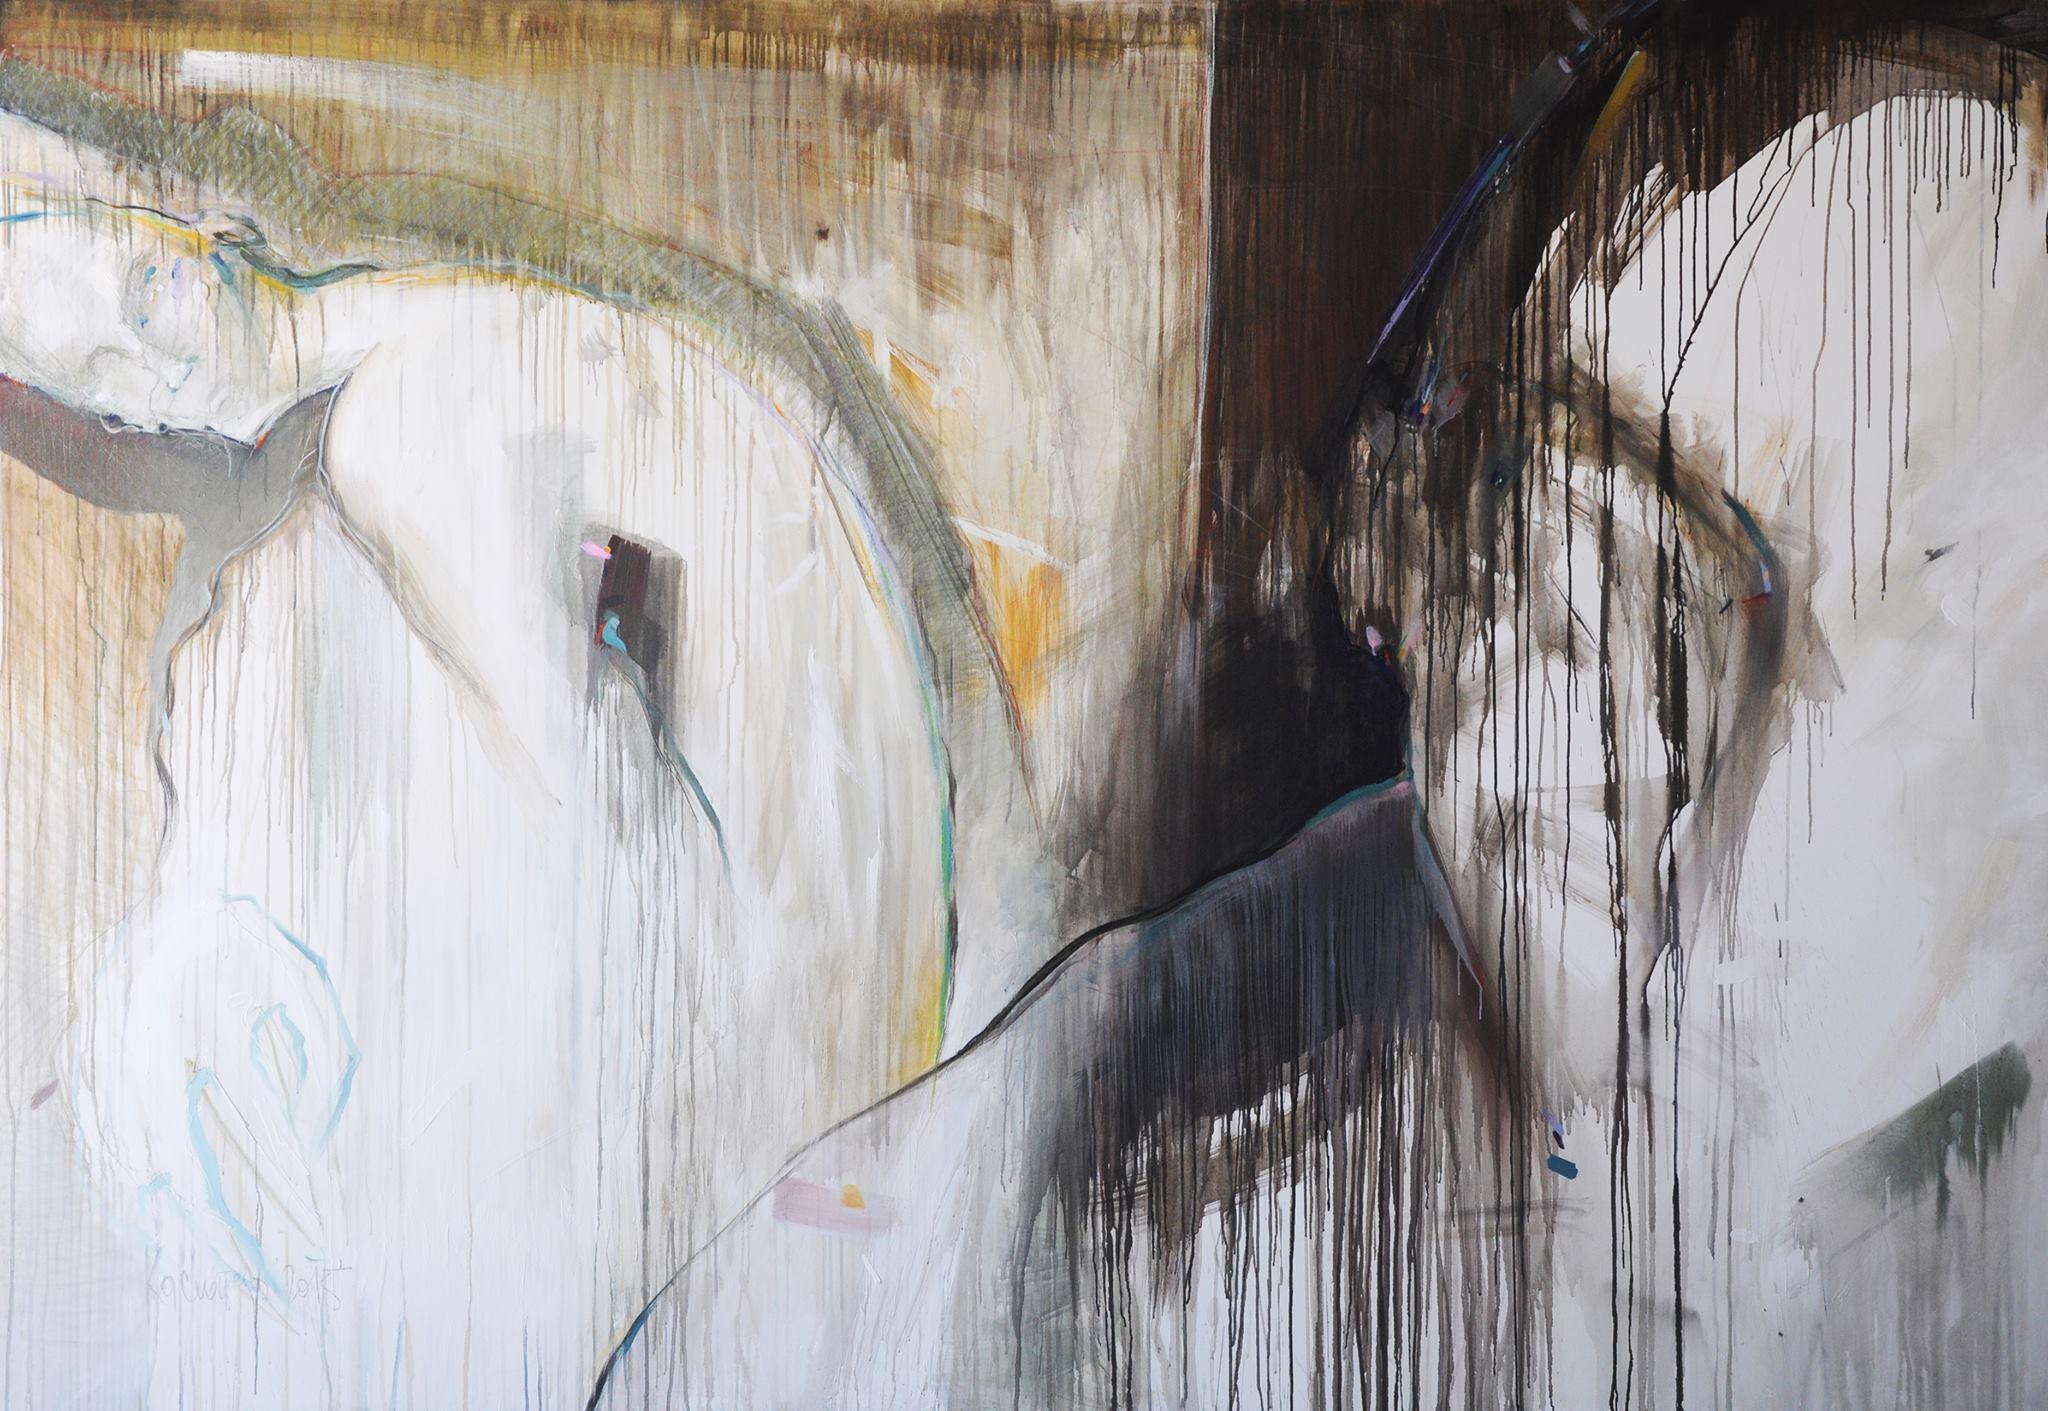 Kasiopeja NAUMOSKA, Painted Words, 2015, acrylic on canvas, 195 x 285 cm